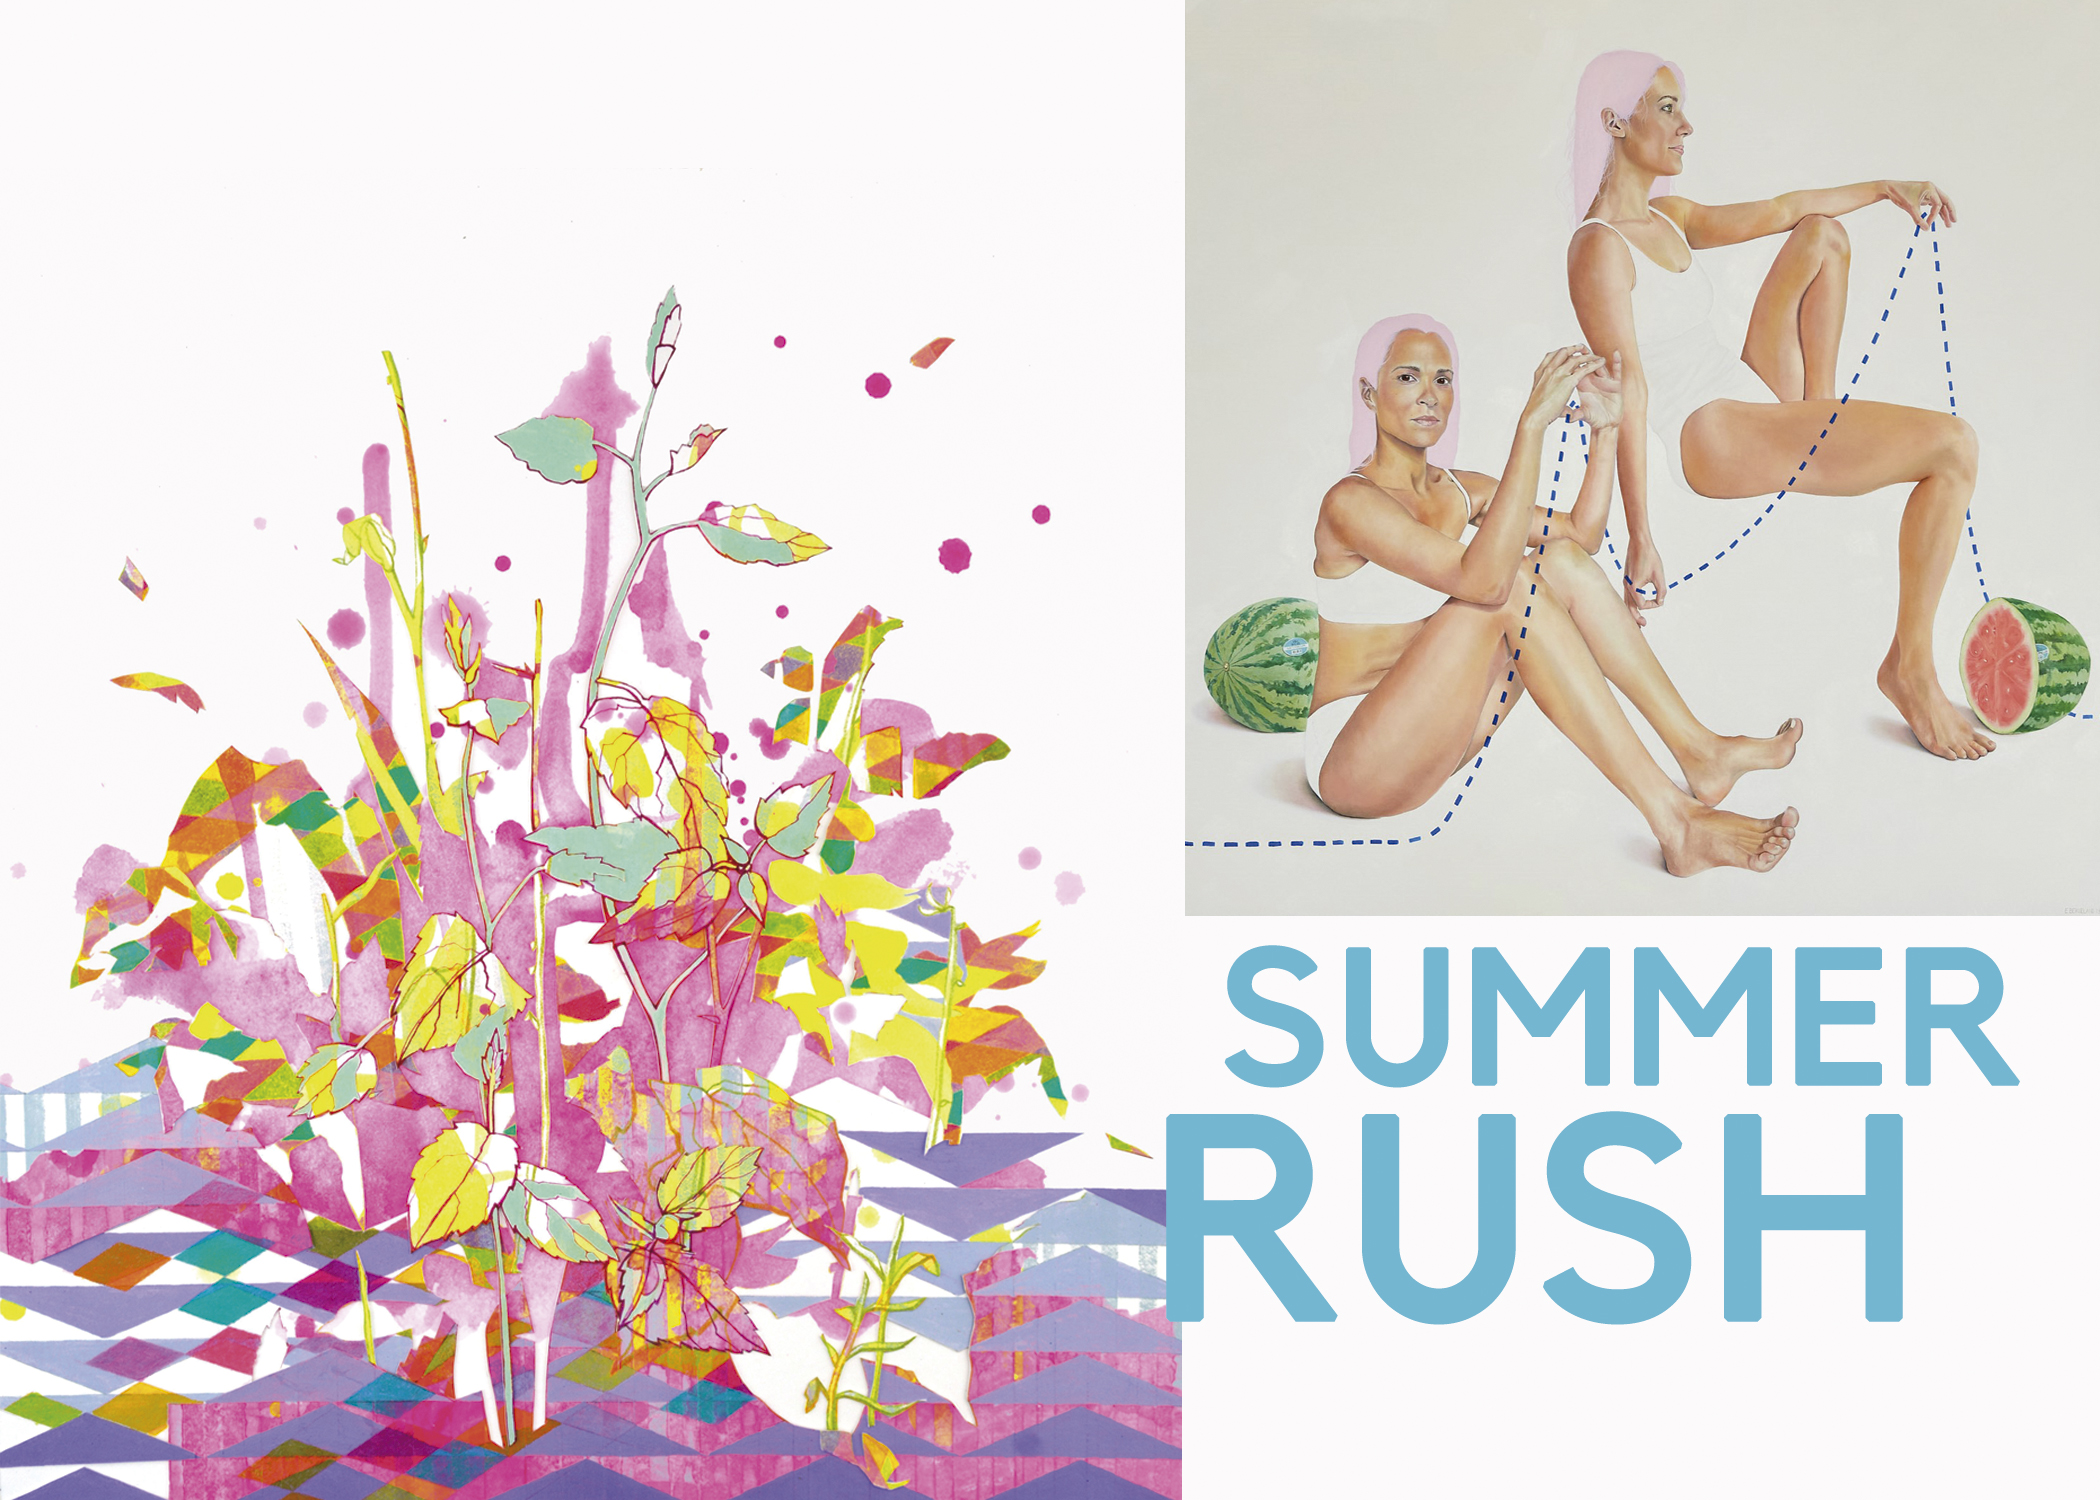 summer+rush+postcard+frontrgb2.jpg